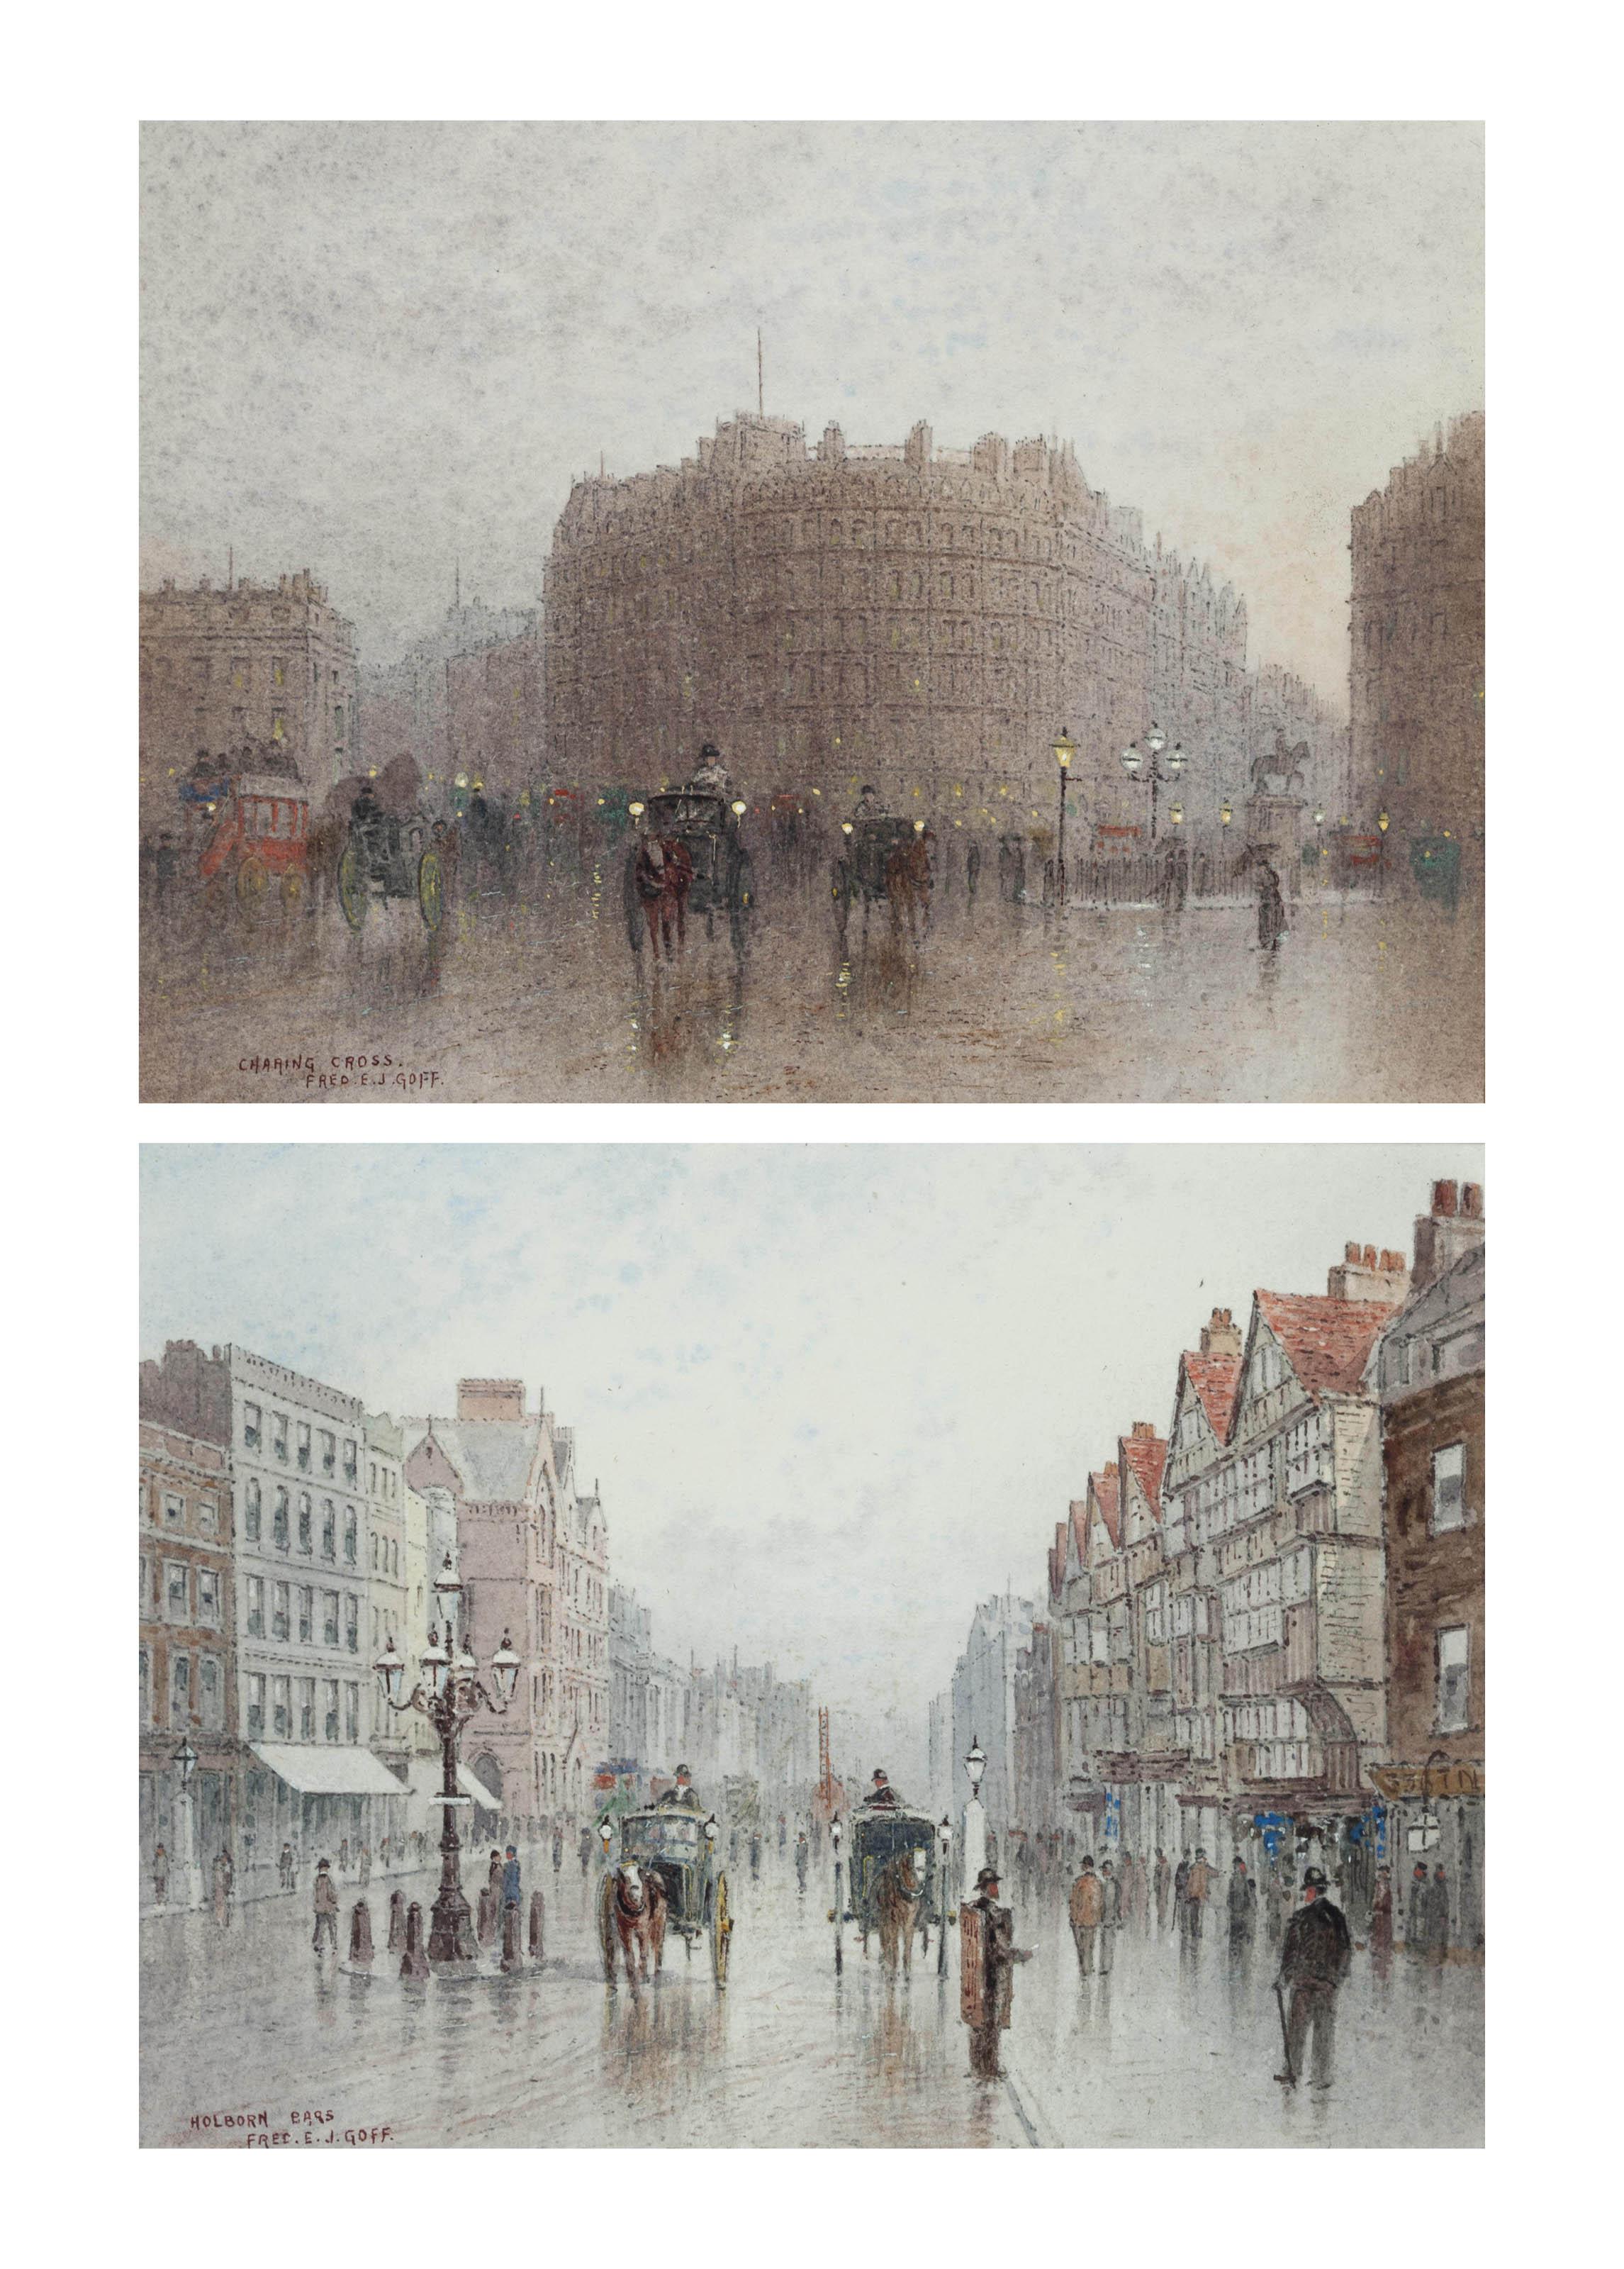 Charing Cross; and Holborn Bars